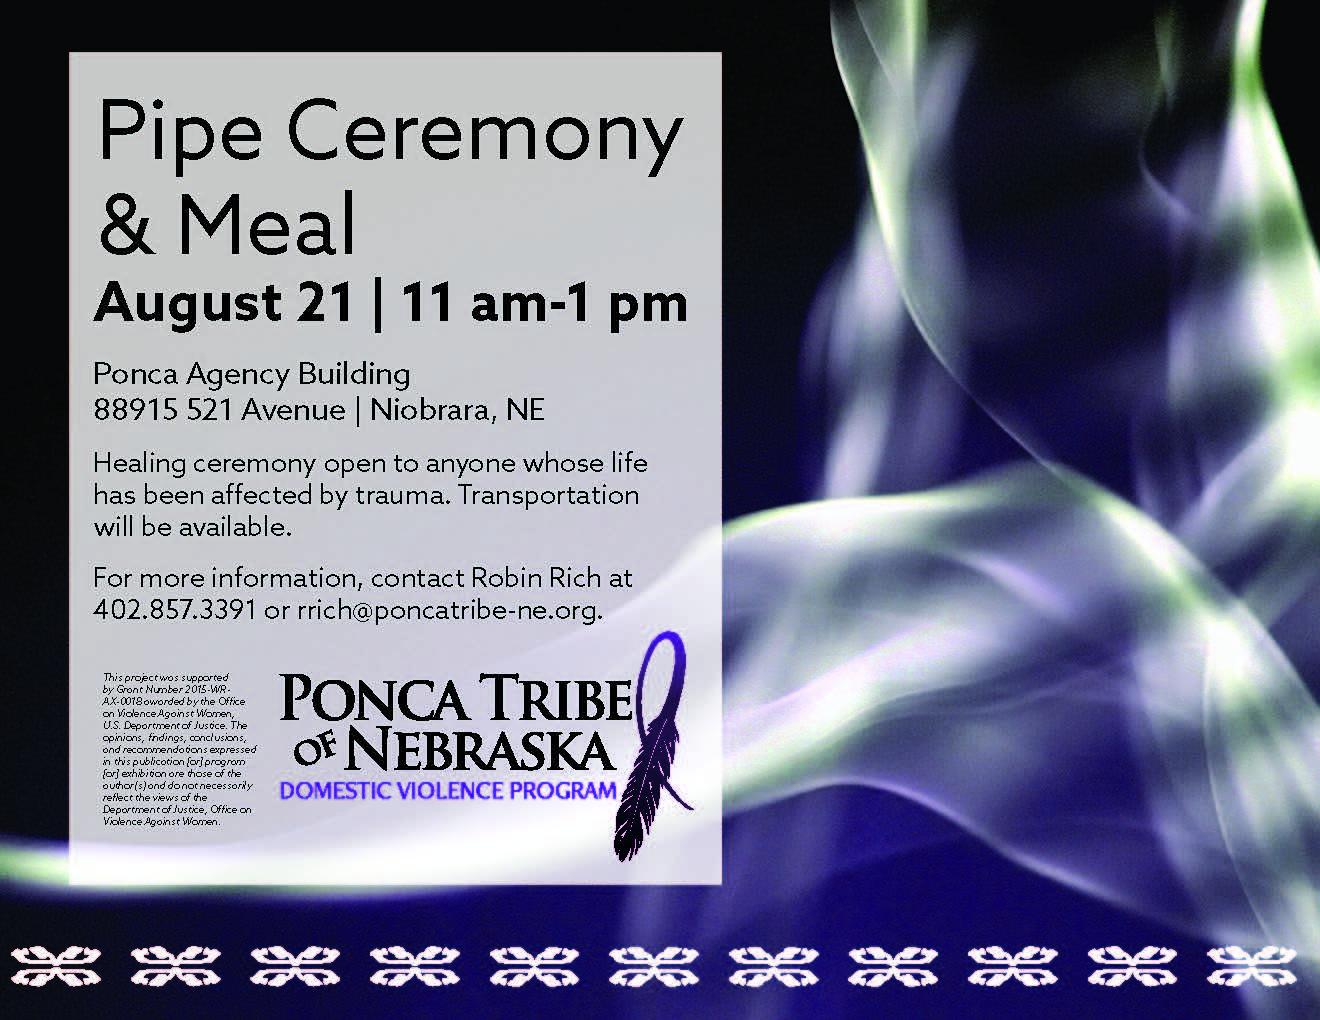 Pipe Ceremony Niobrara